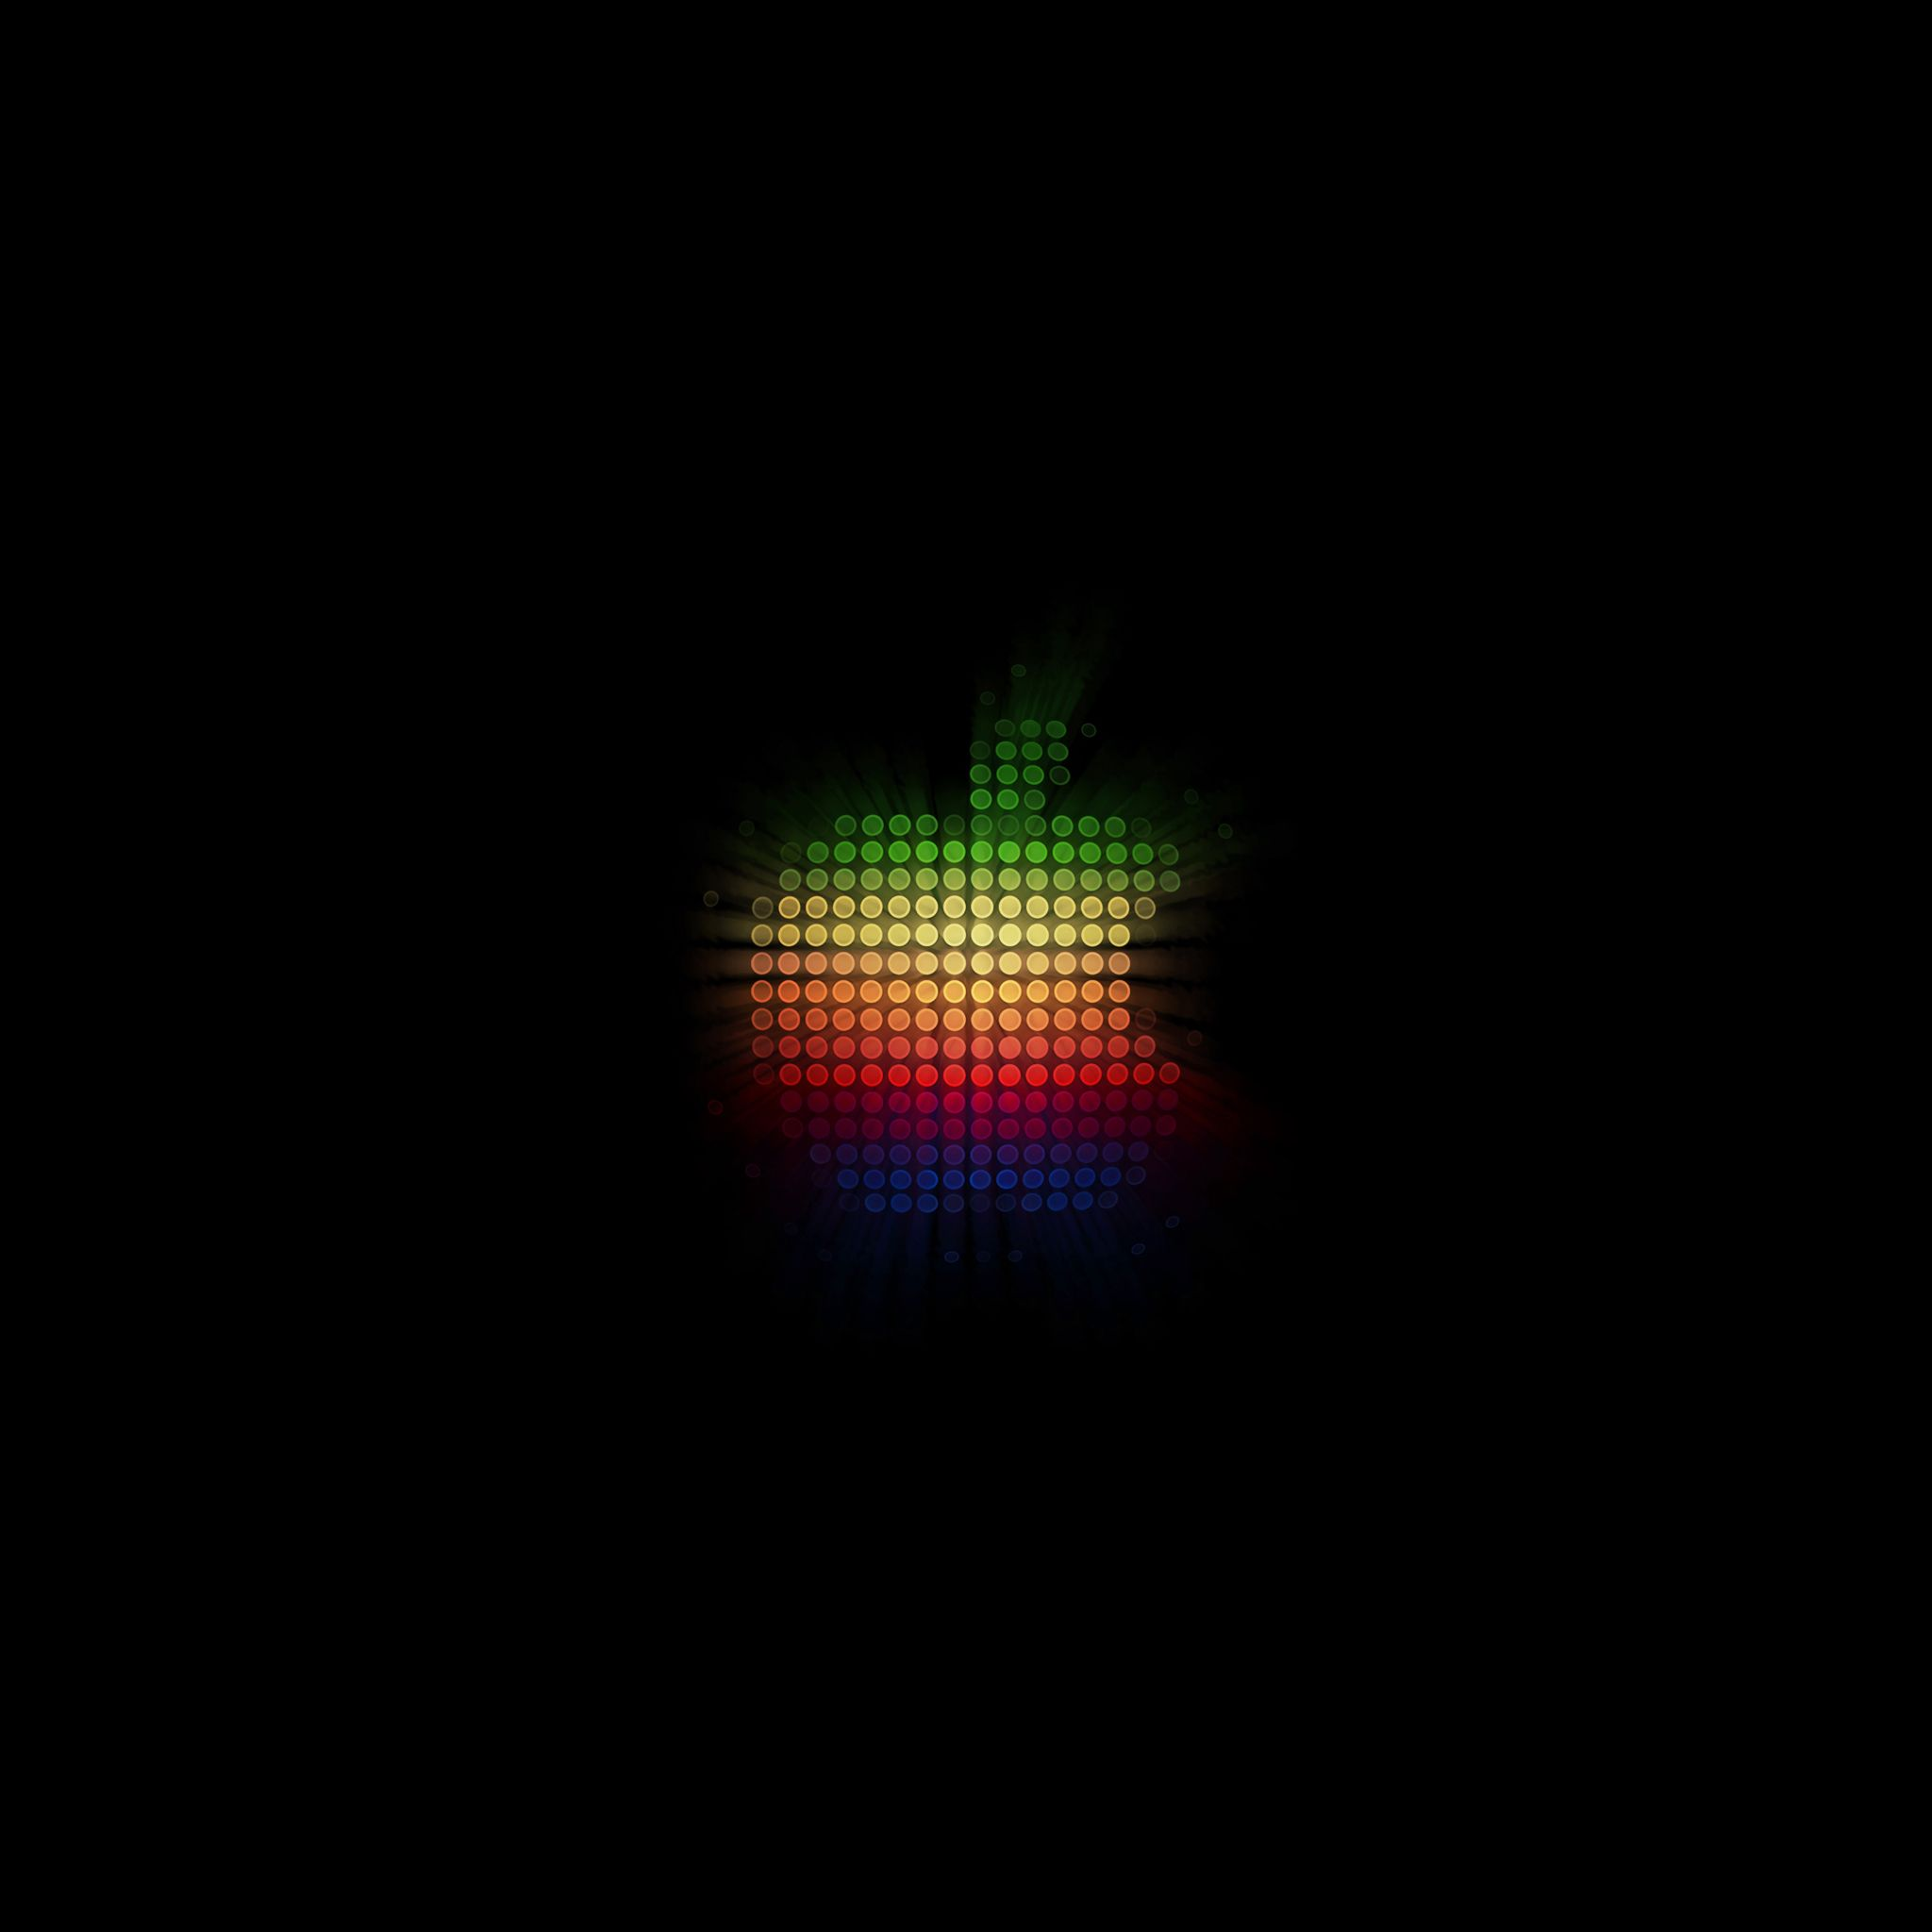 Ipad Air Apple Wallpaper アップルの壁紙 壁紙 モチーフ